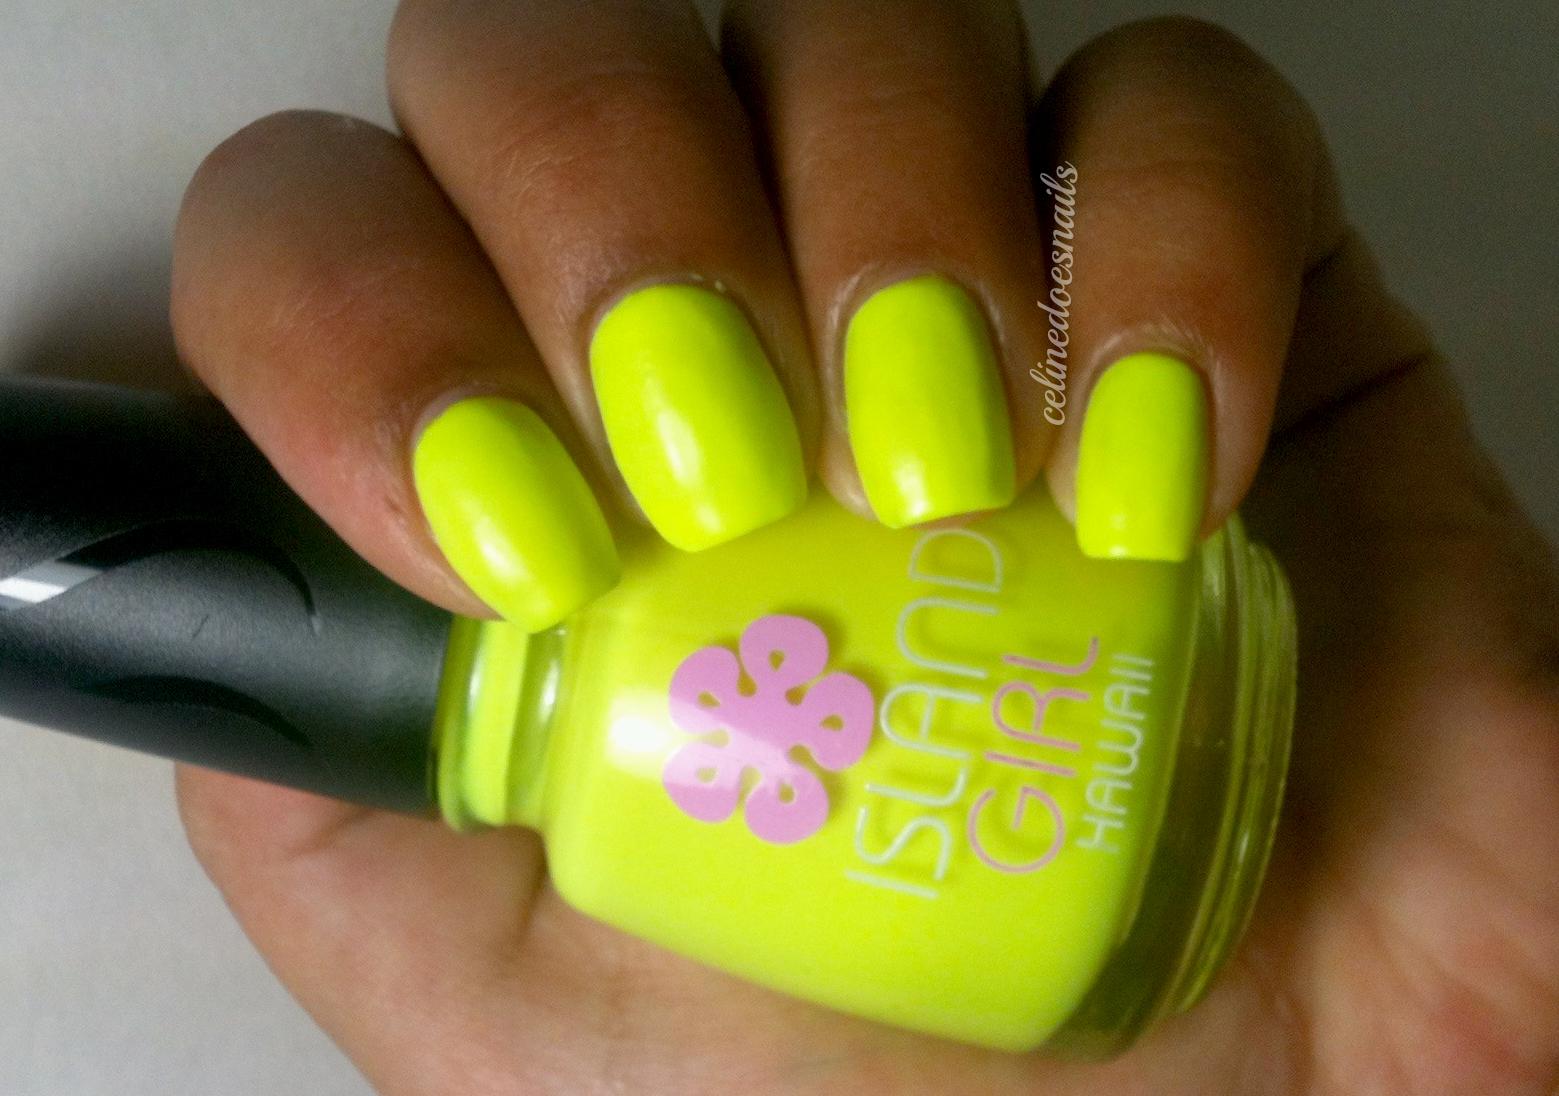 Nails By Celine: Island Girl Polishes- Sugar Cane & Plain Glow in ...